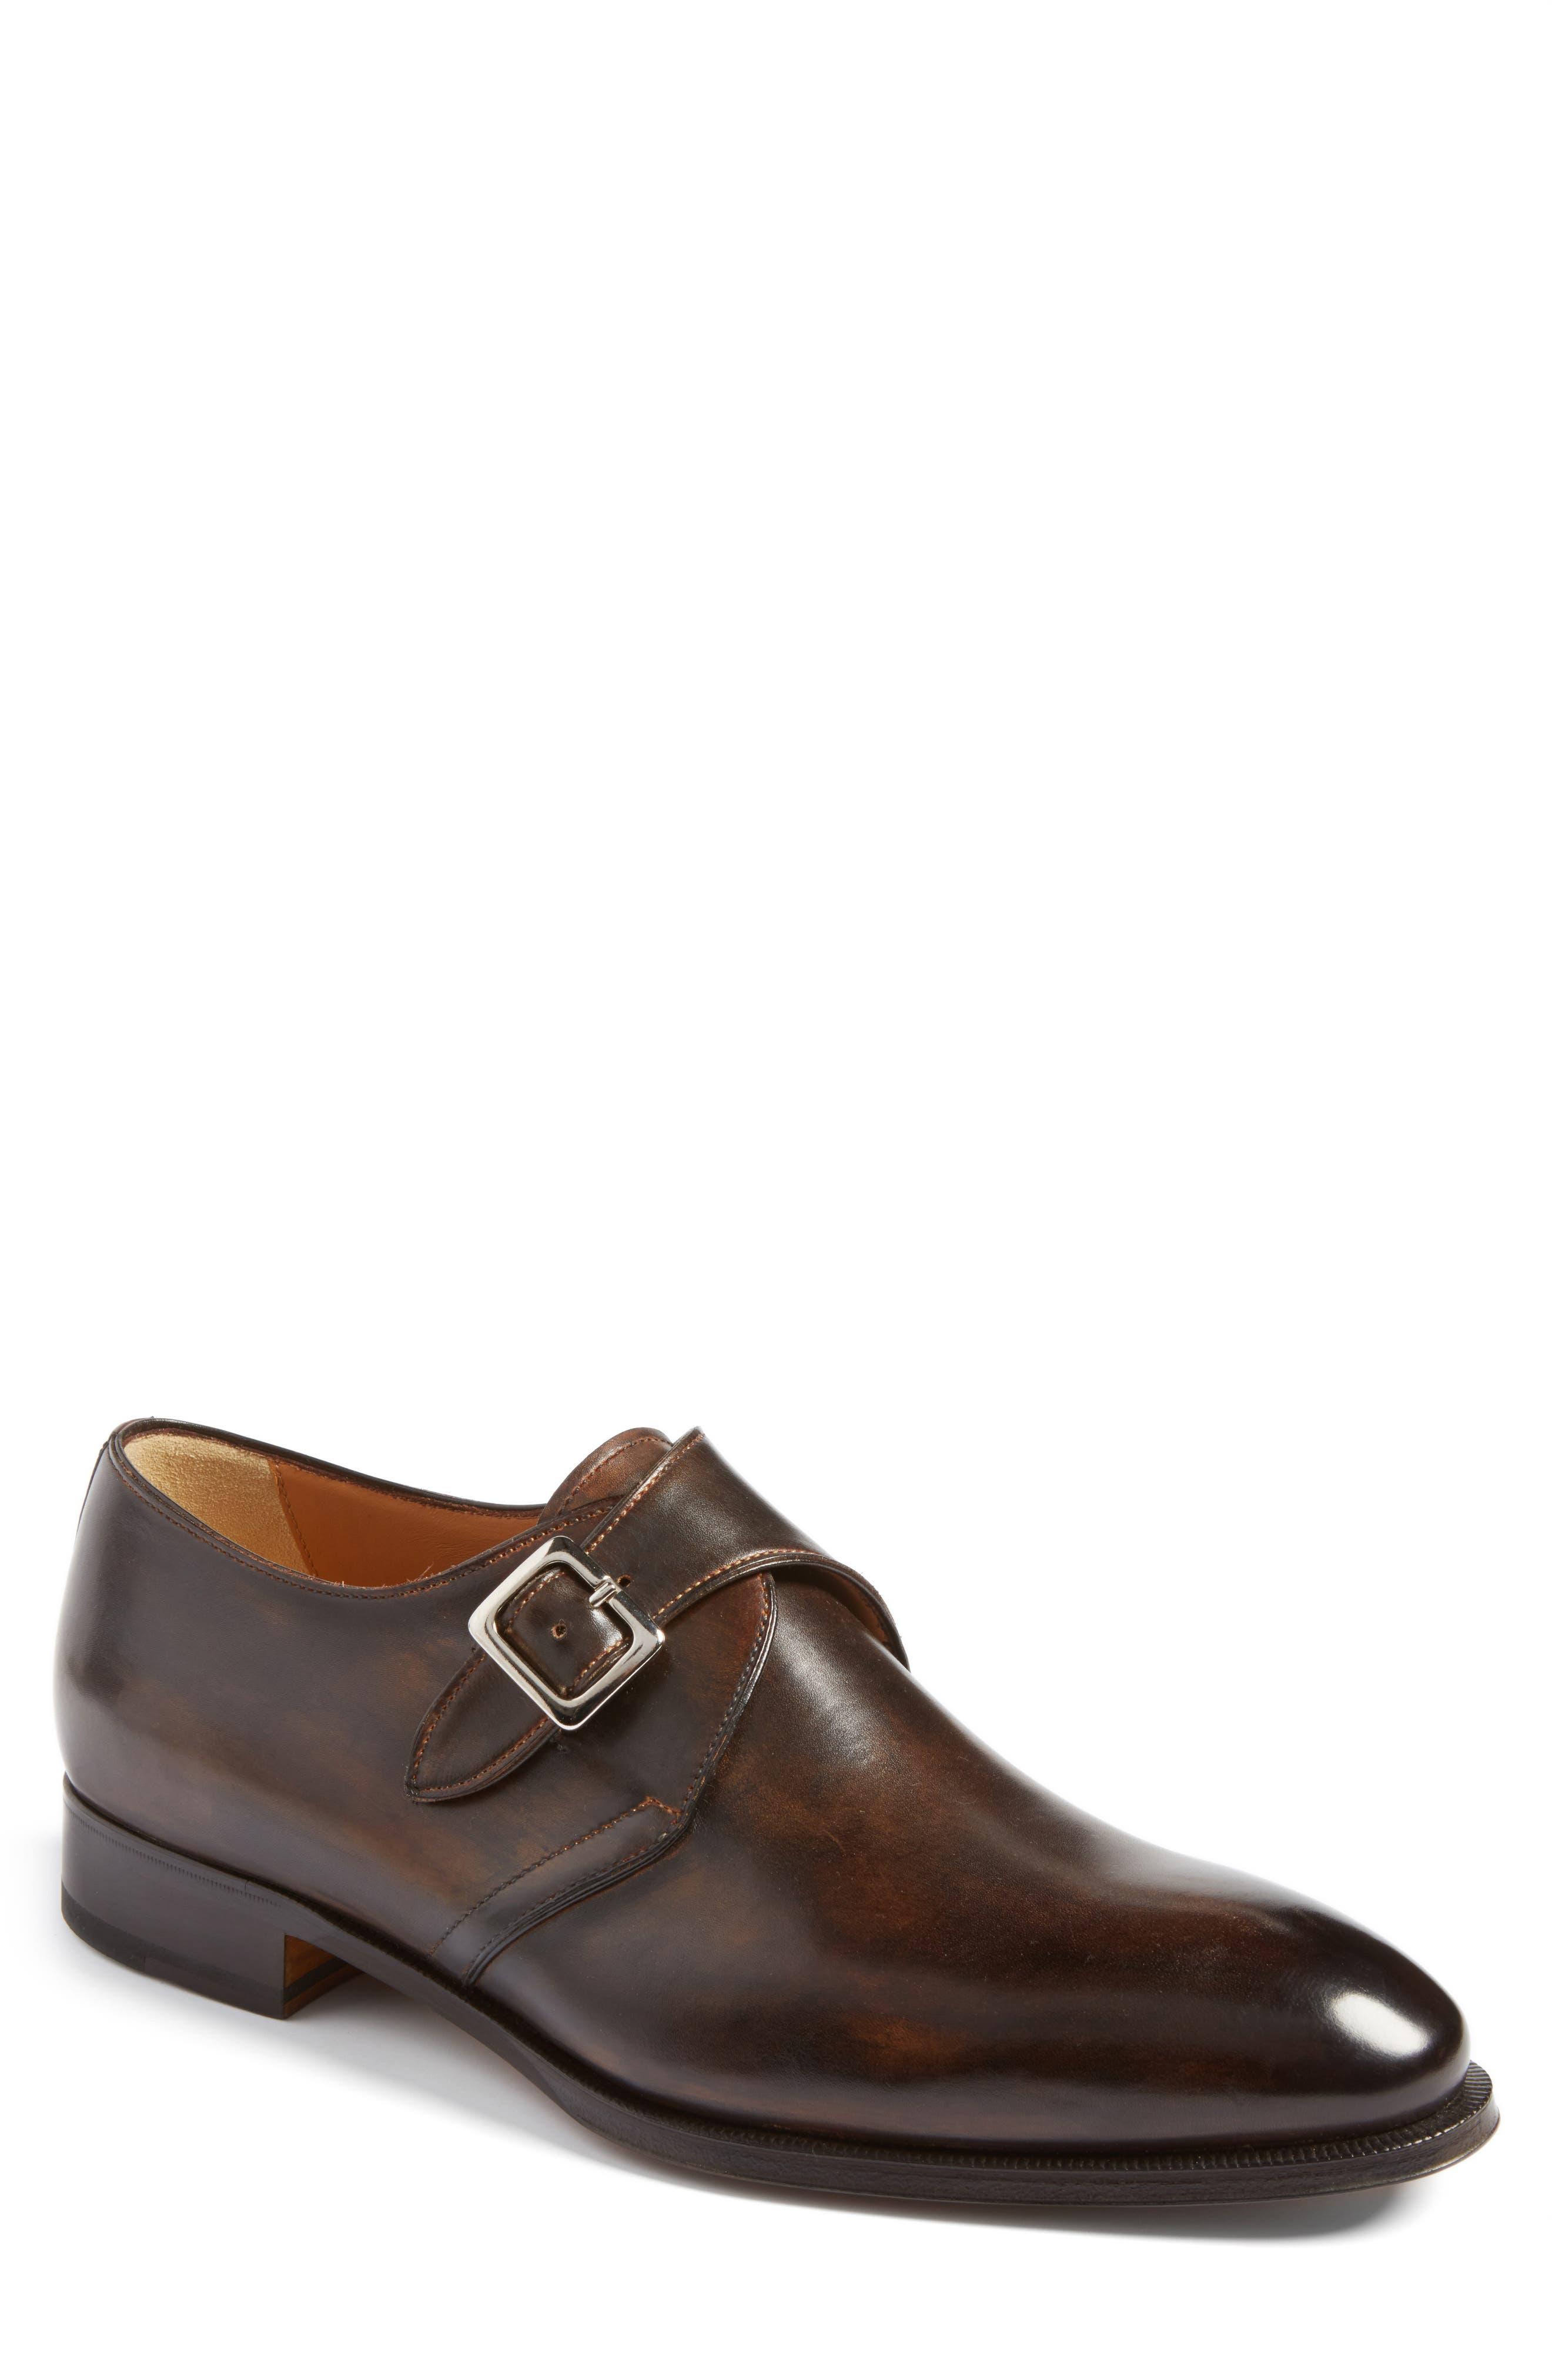 Monk Strap Shoe,                             Main thumbnail 1, color,                             Brown